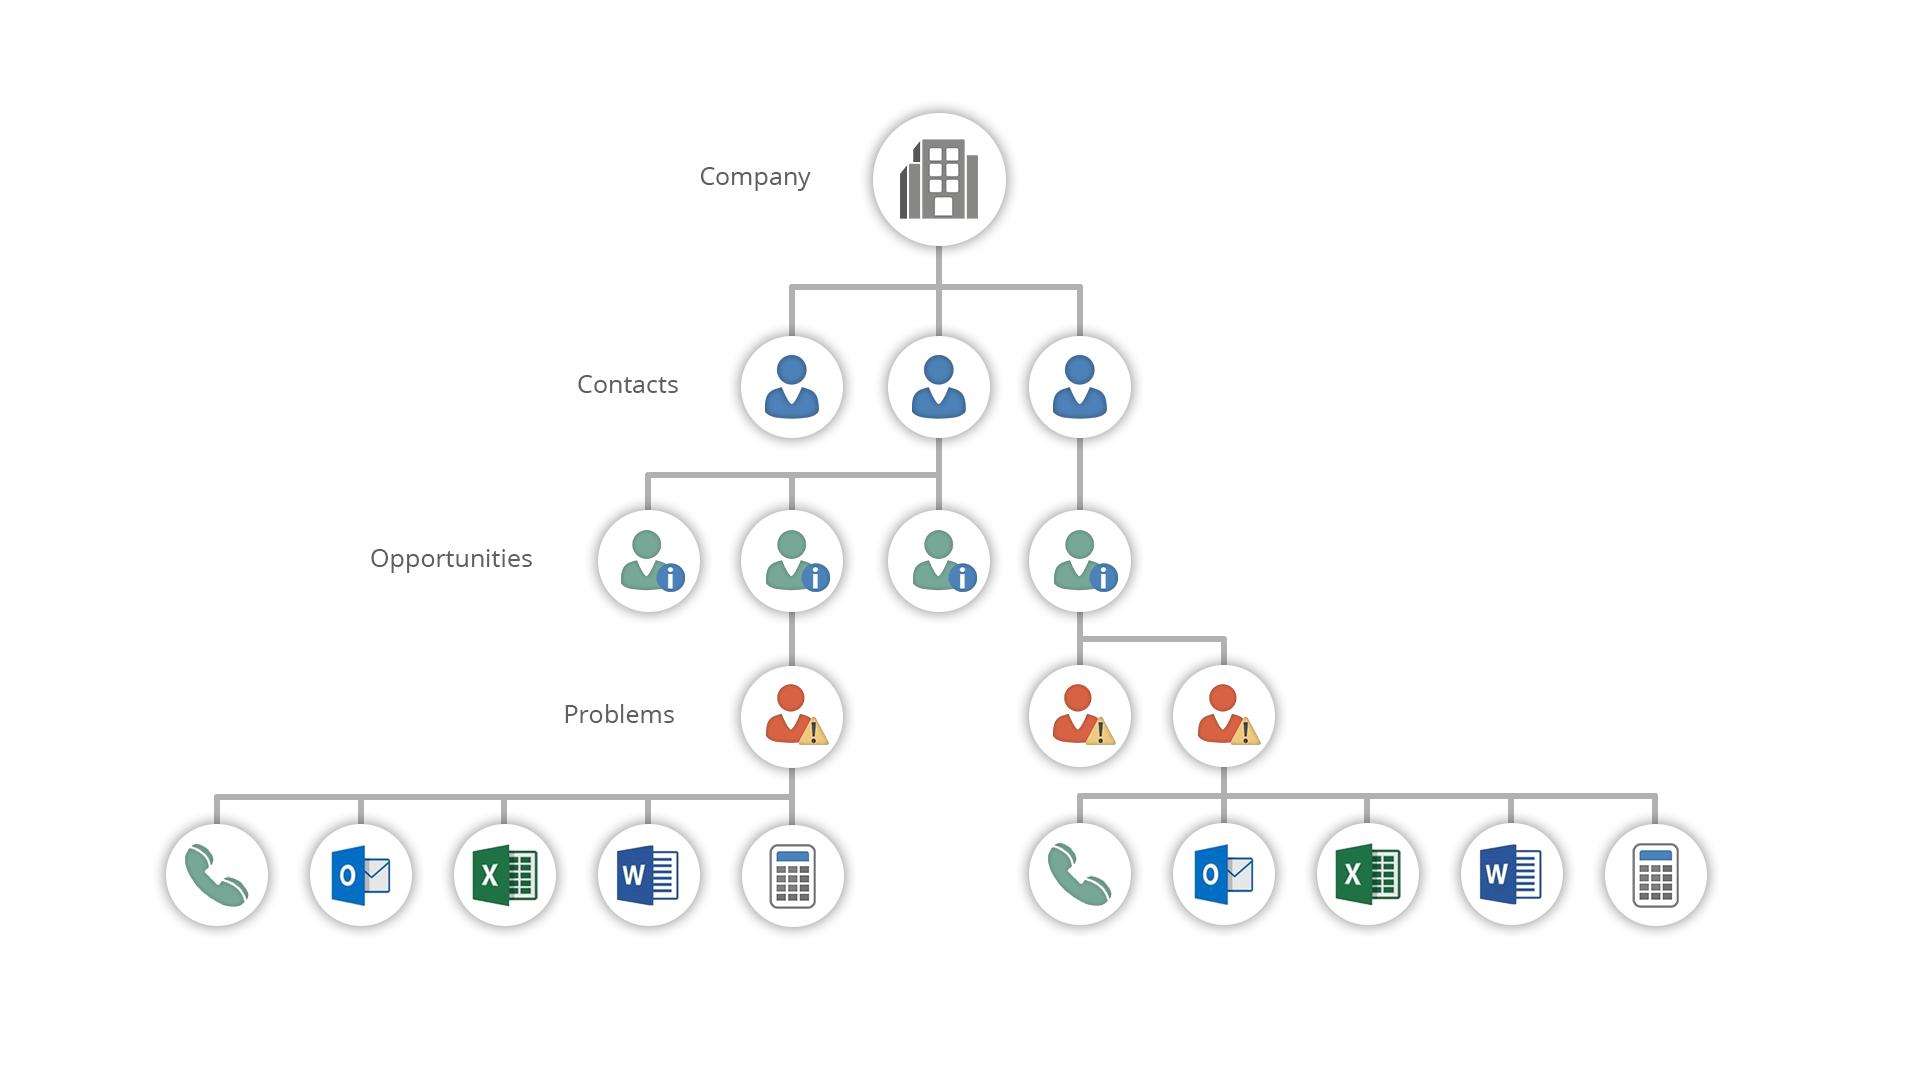 Single Company Hierarchy in Prospect CRM